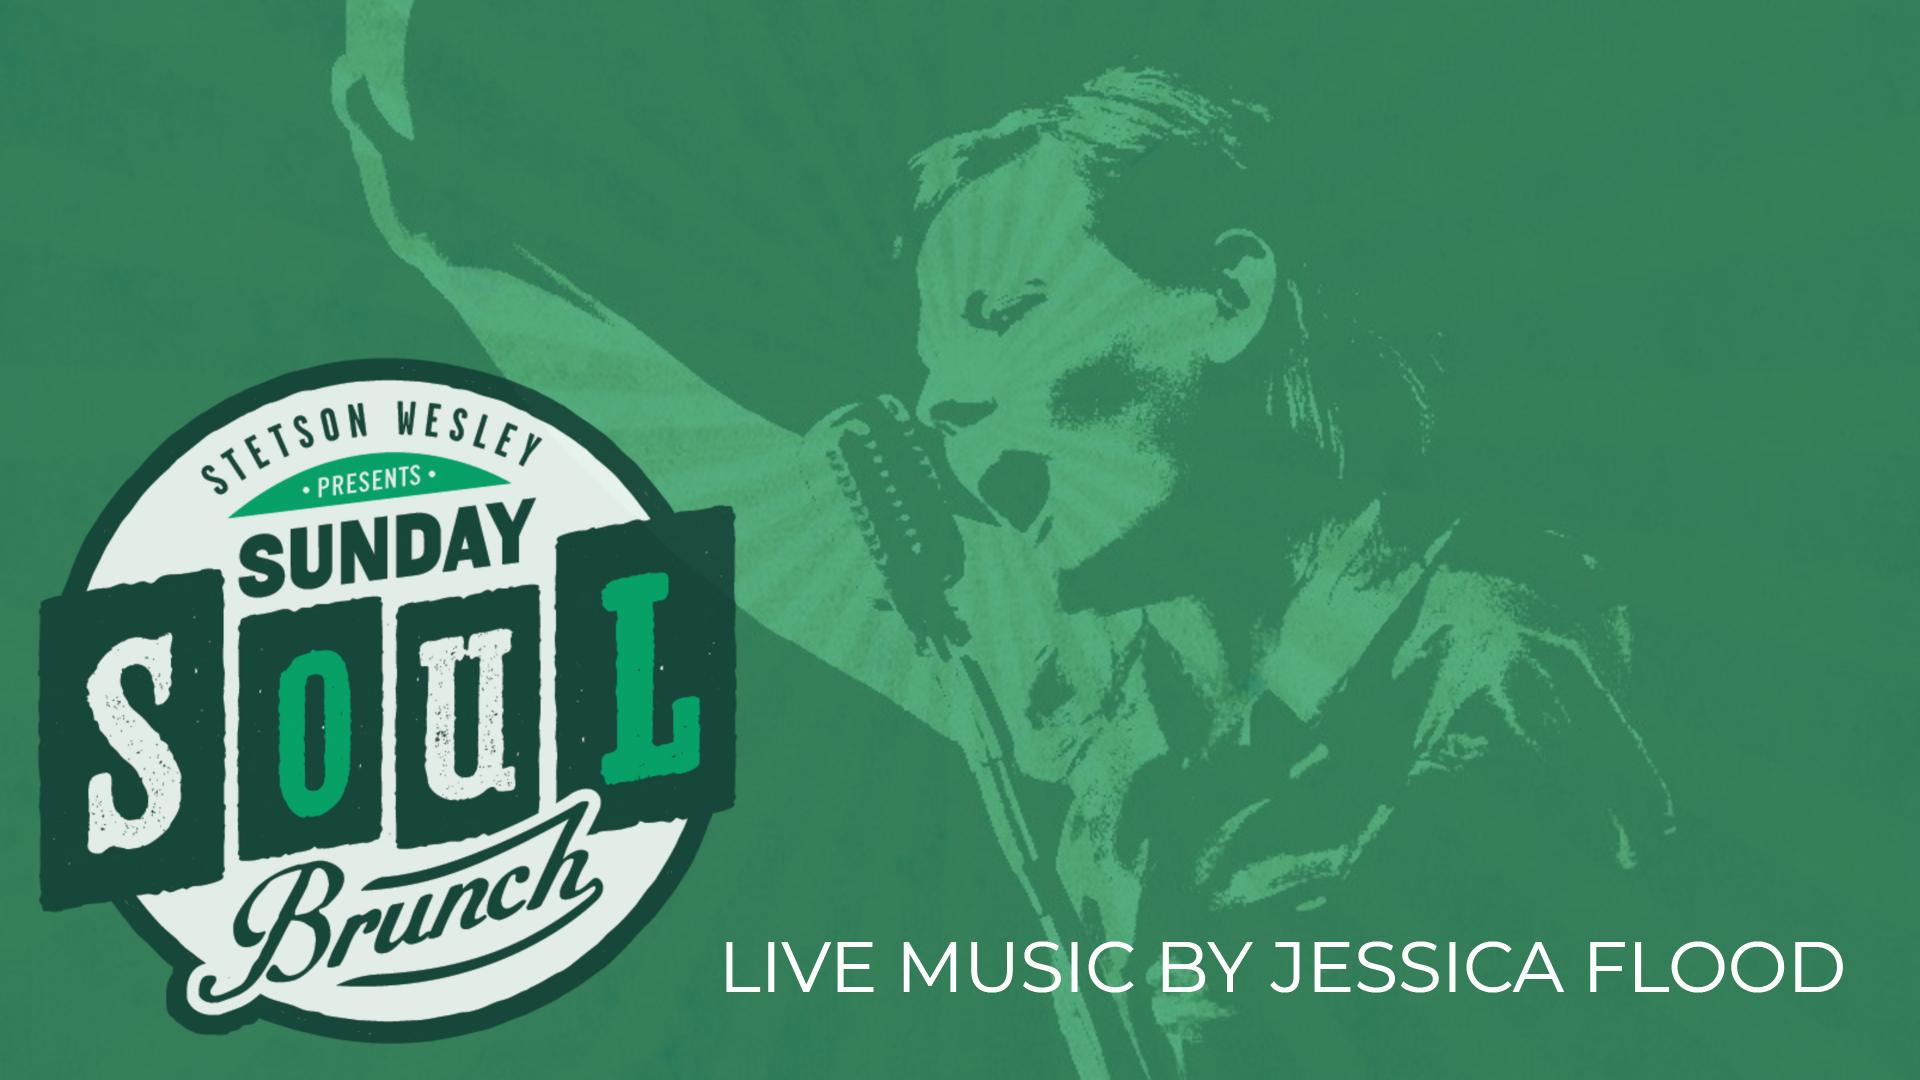 Sunday Soul Brunch | Stetson Wesley Homecoming logo